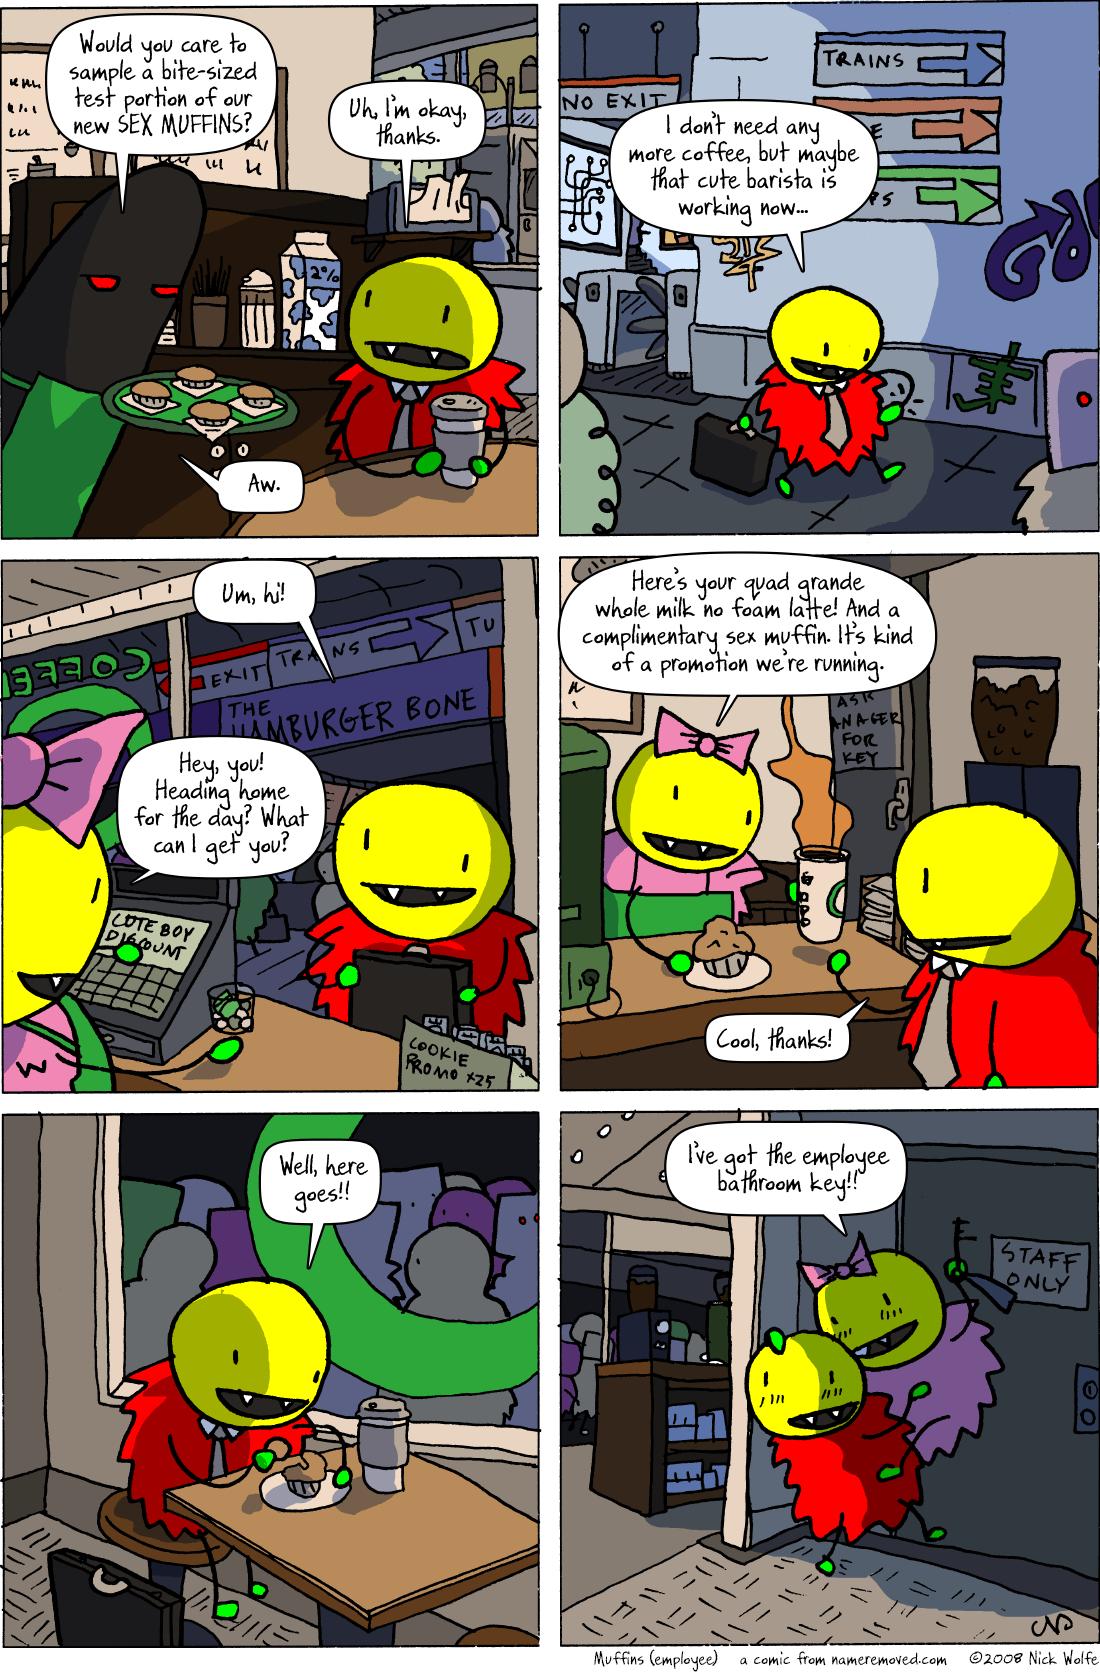 Muffins (employee)